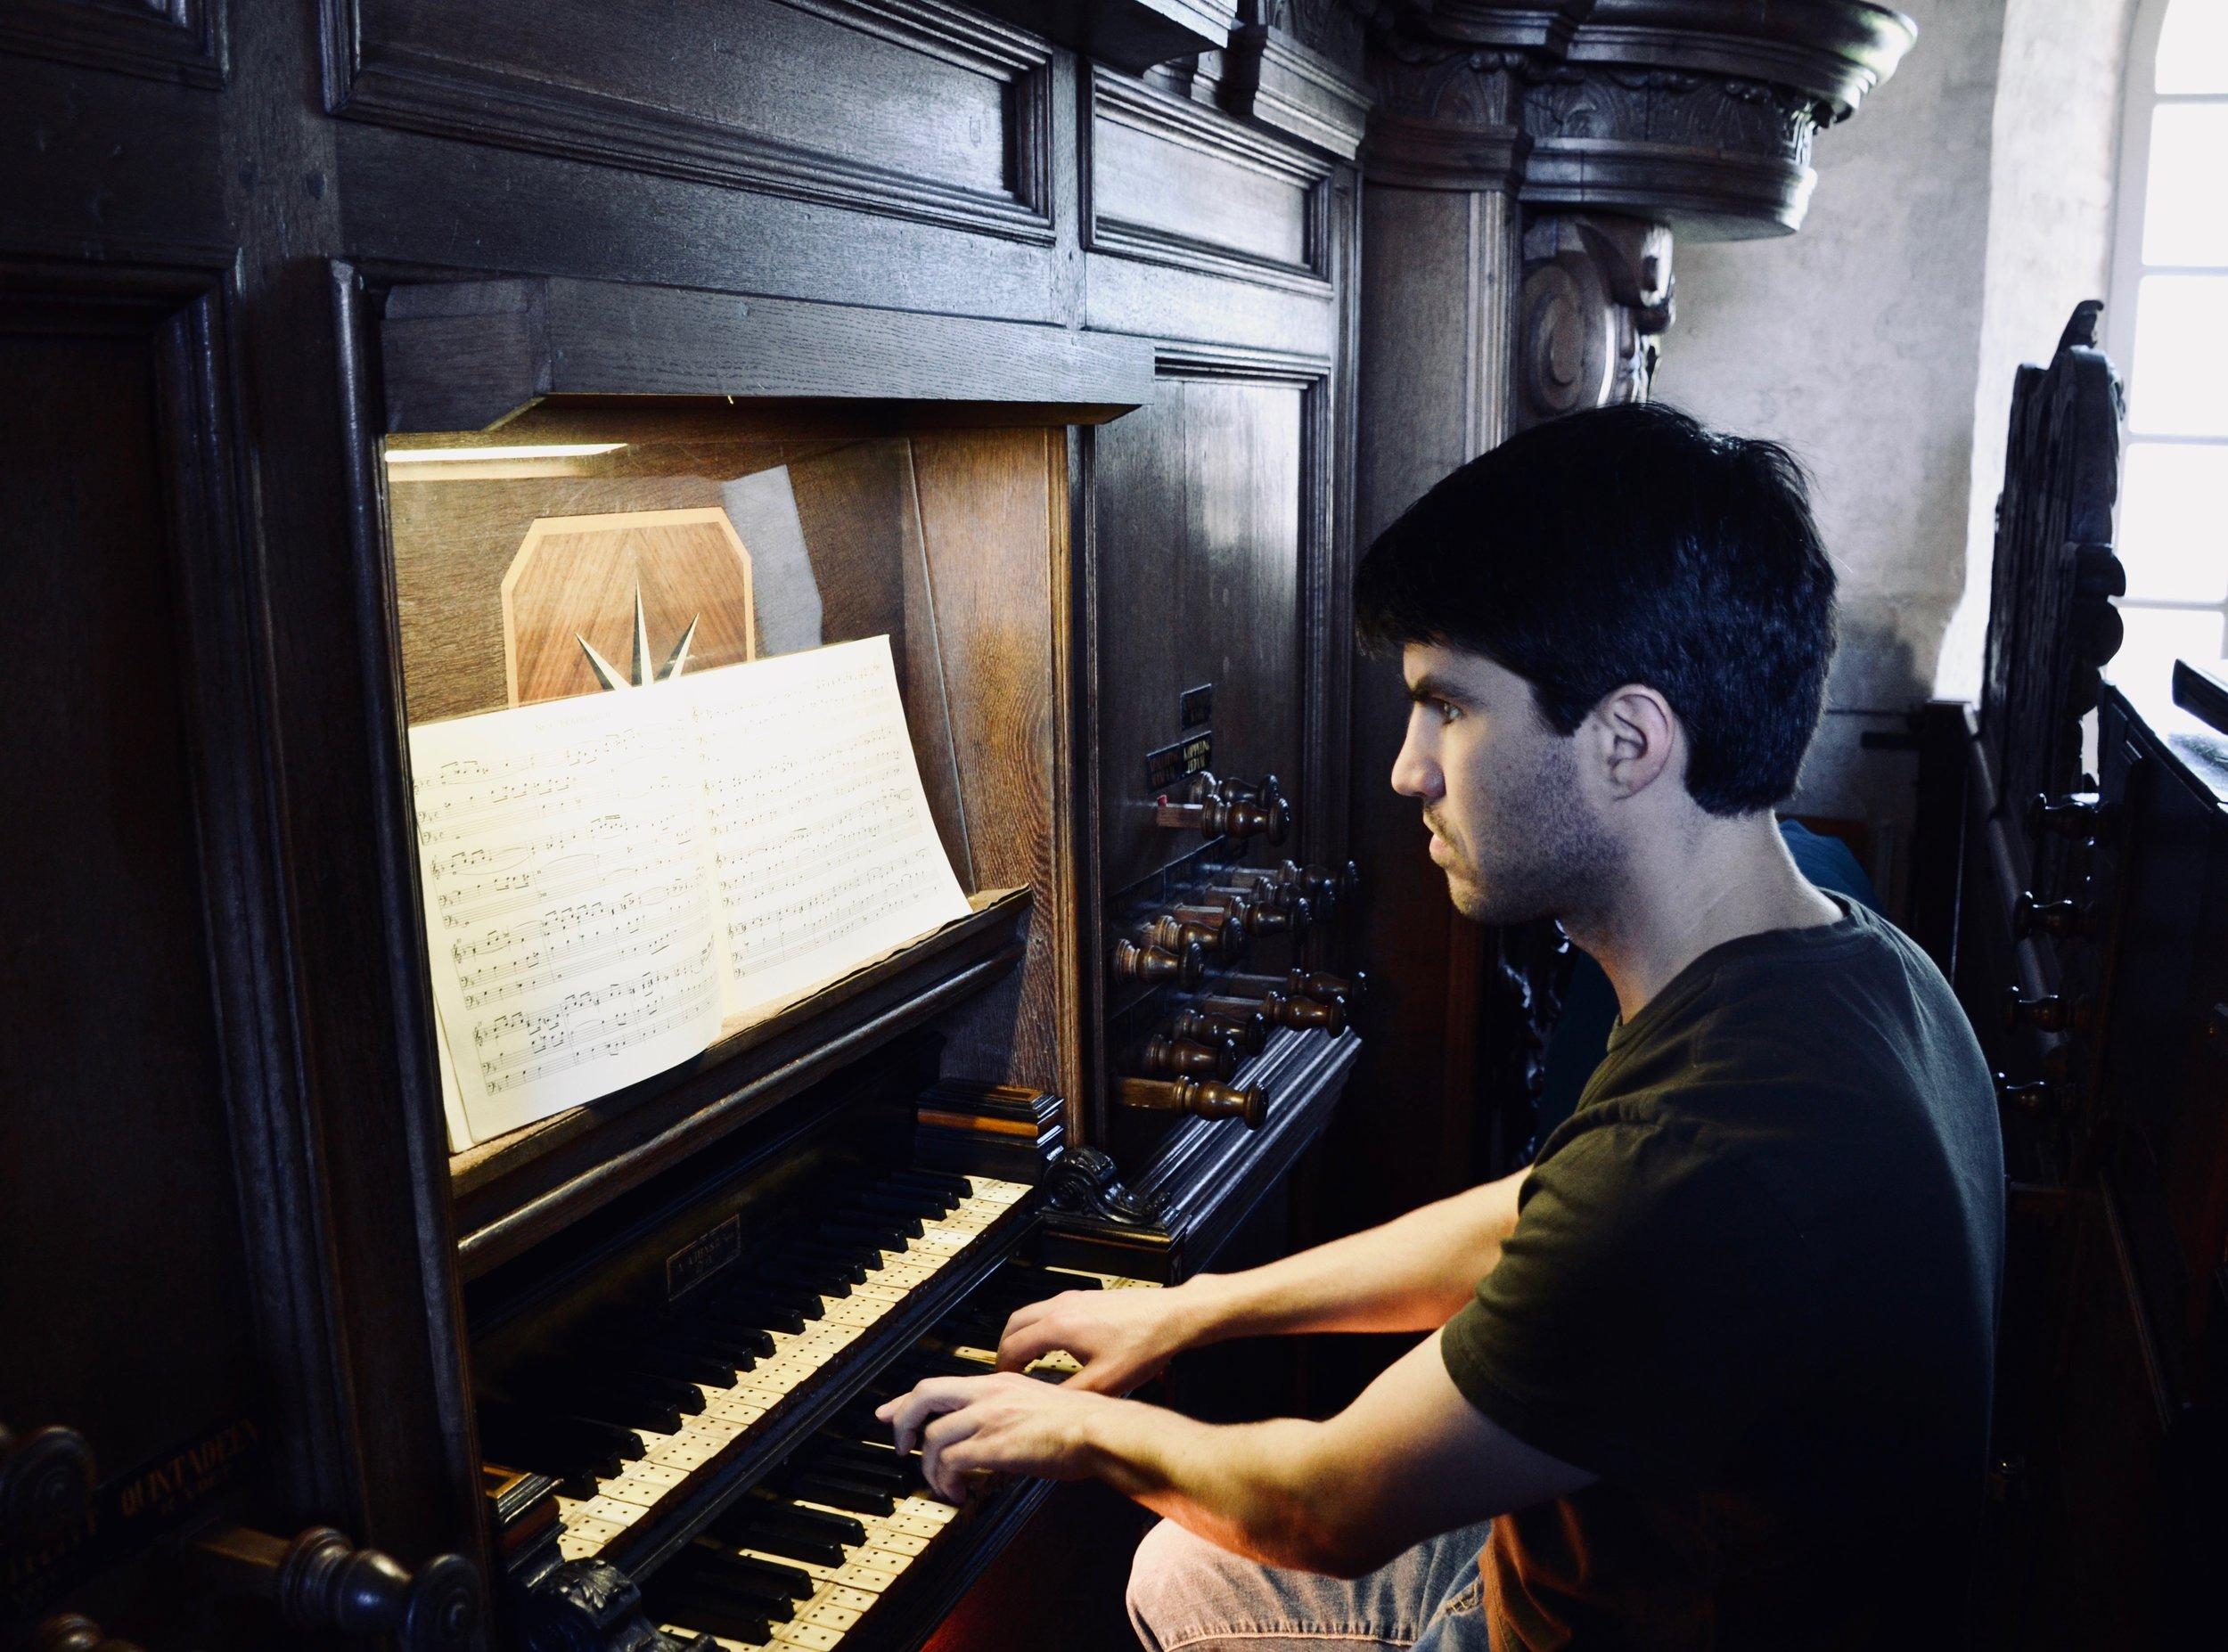 Brandon Santini plays the 1733 Hinsz organ, Leens, Holland.